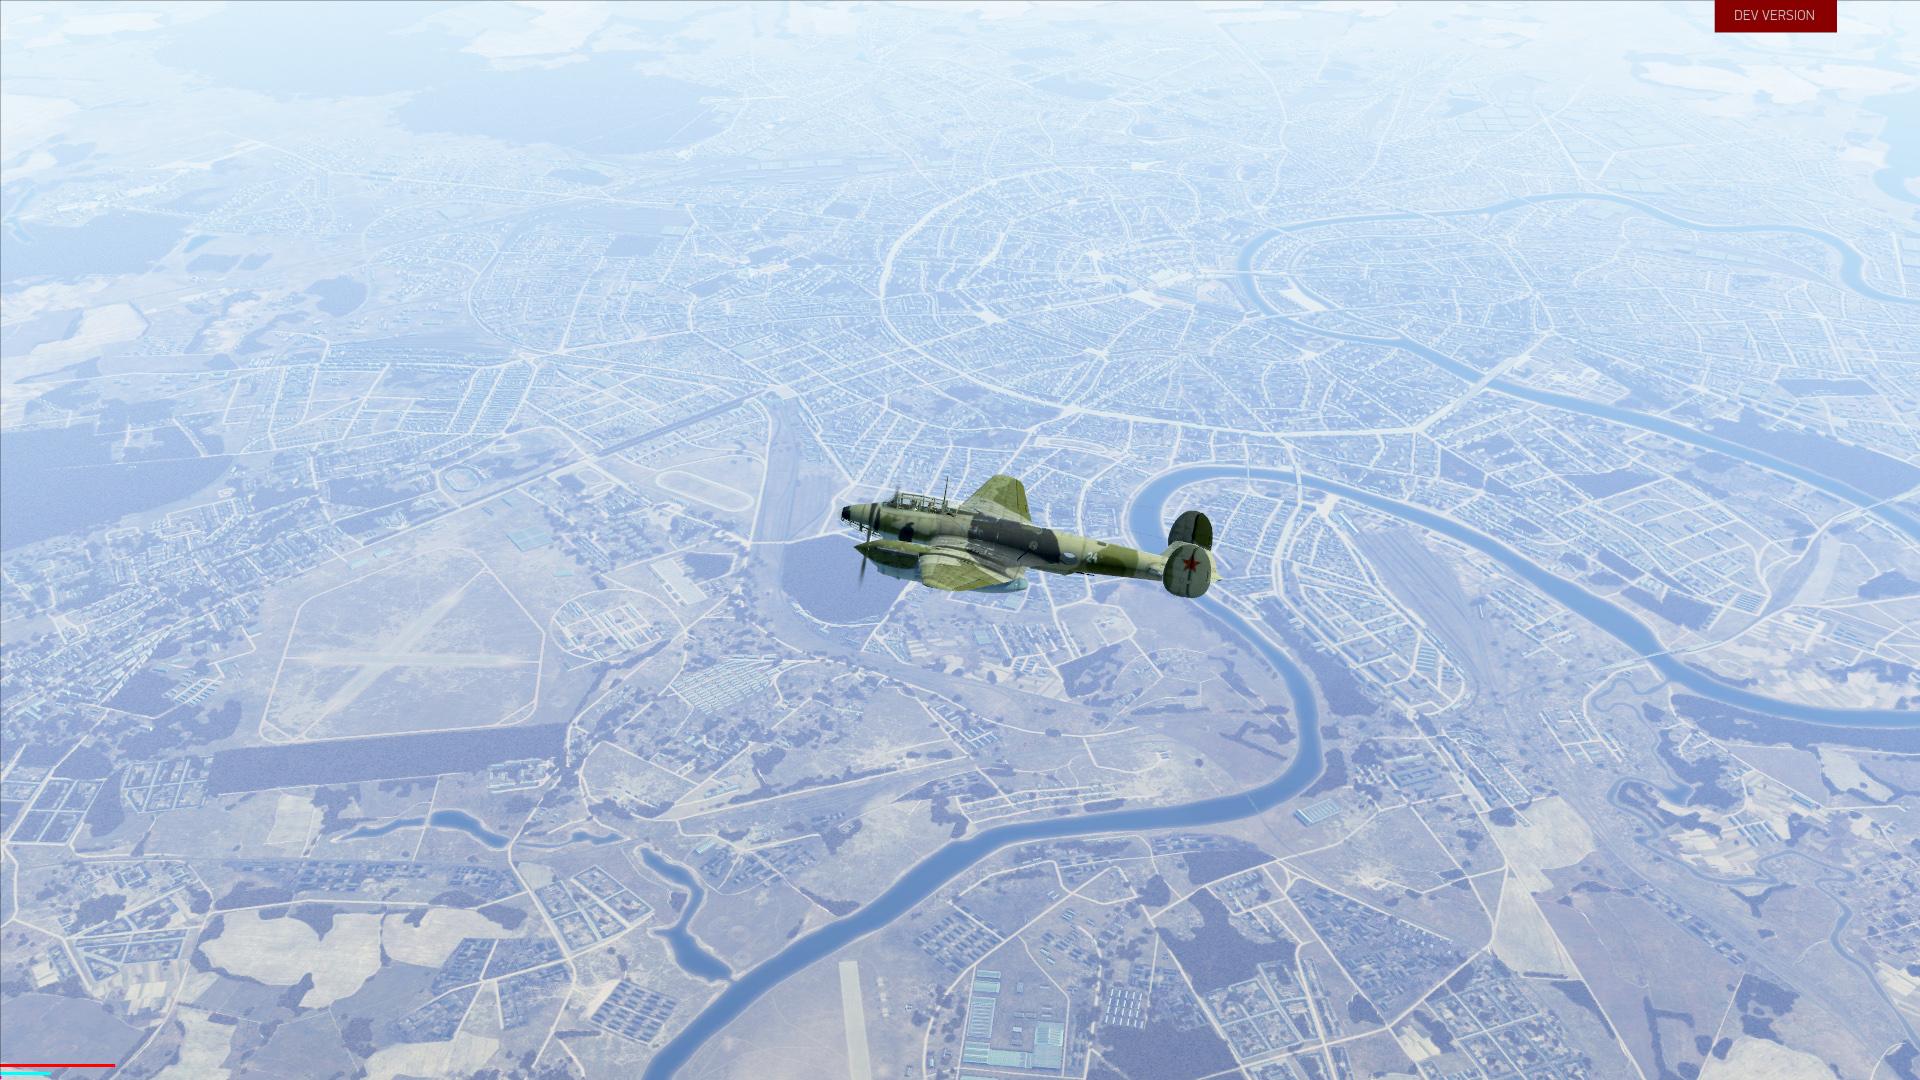 Il  Sturmovik Battle Of Stalingrad Objects Buildings